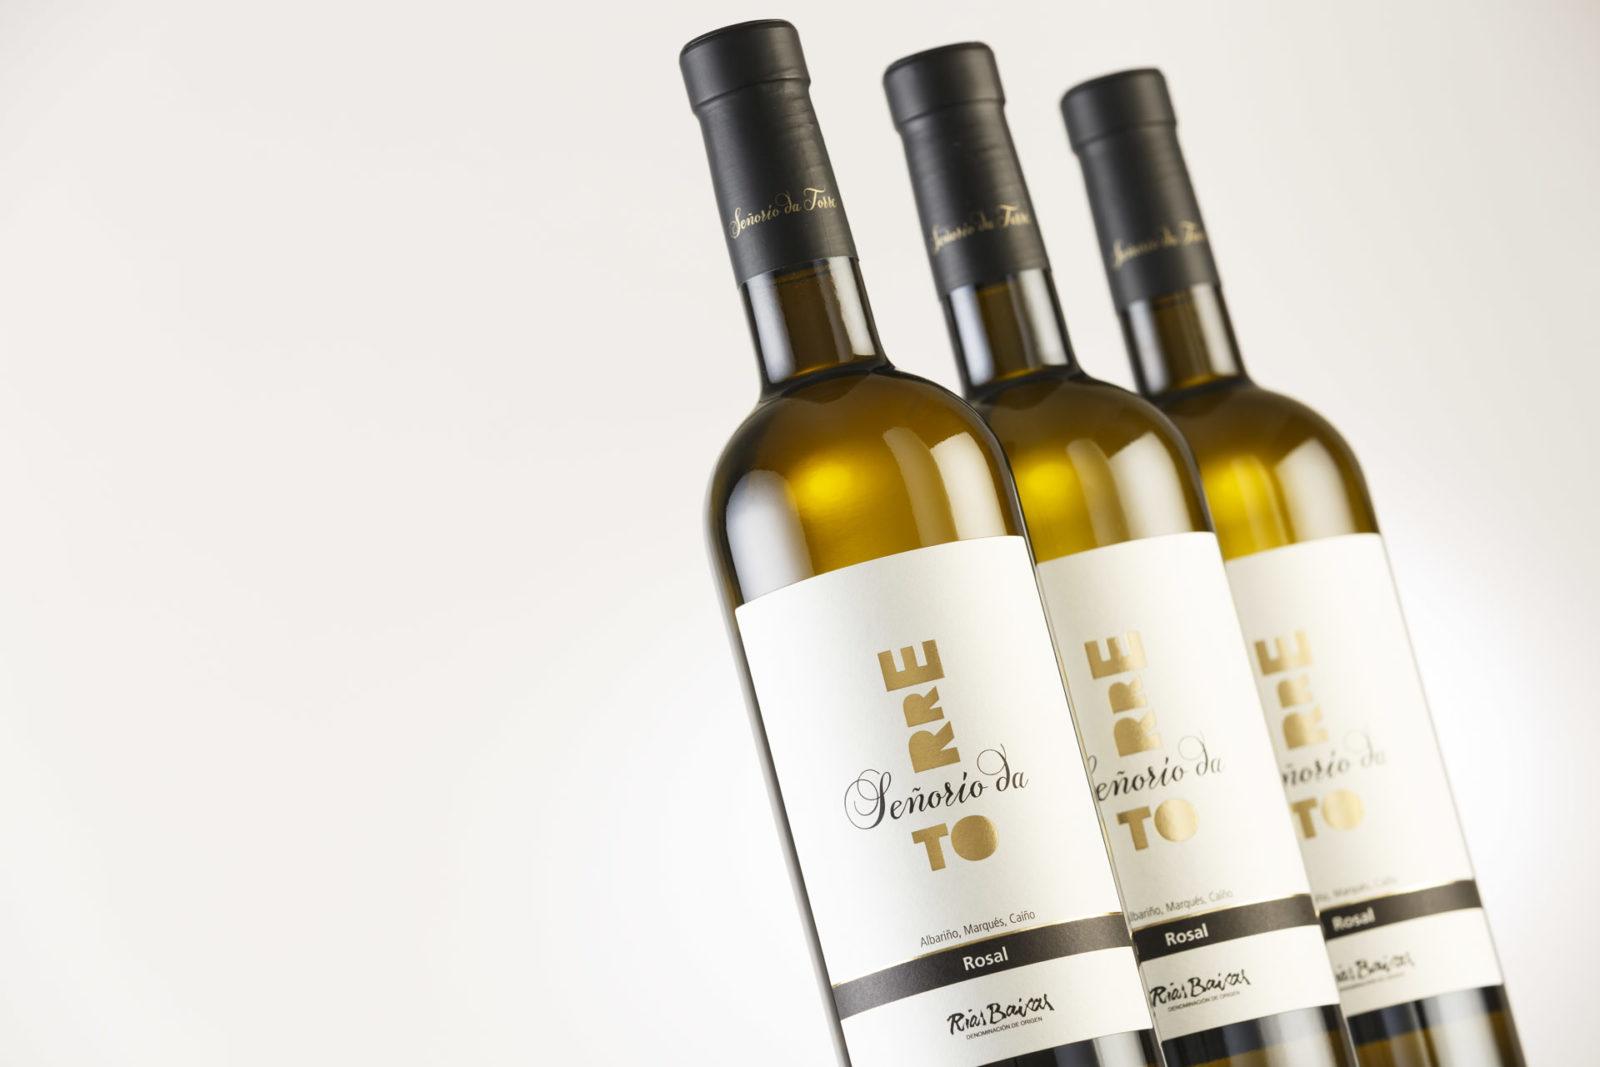 fotografia-vinos-galicia